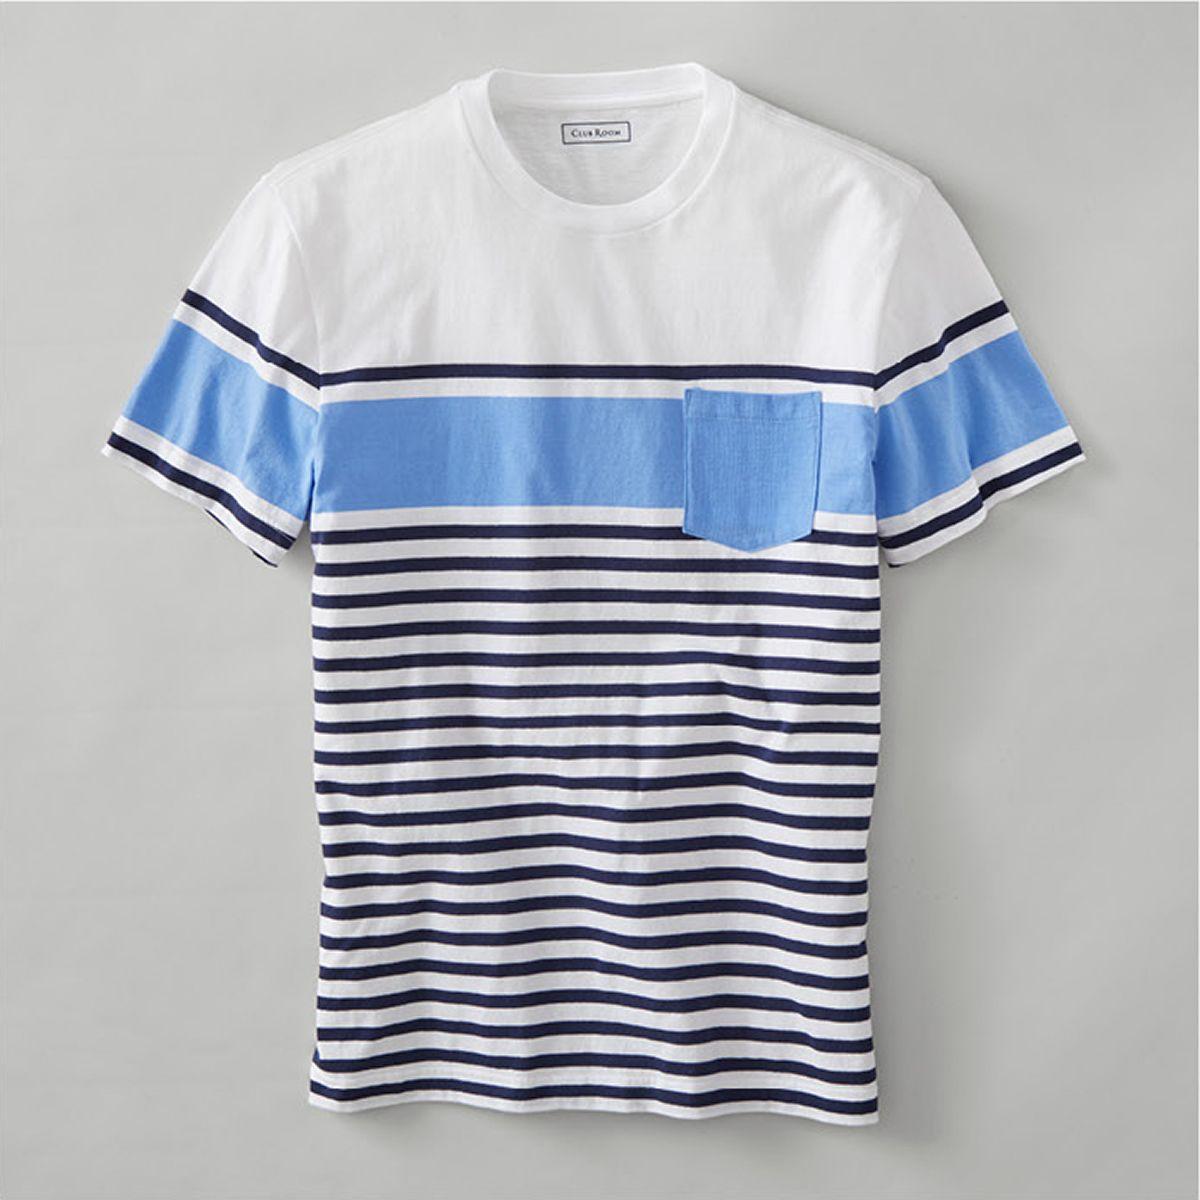 31f70ae20f2 Nike Men s Shirts - Macy s